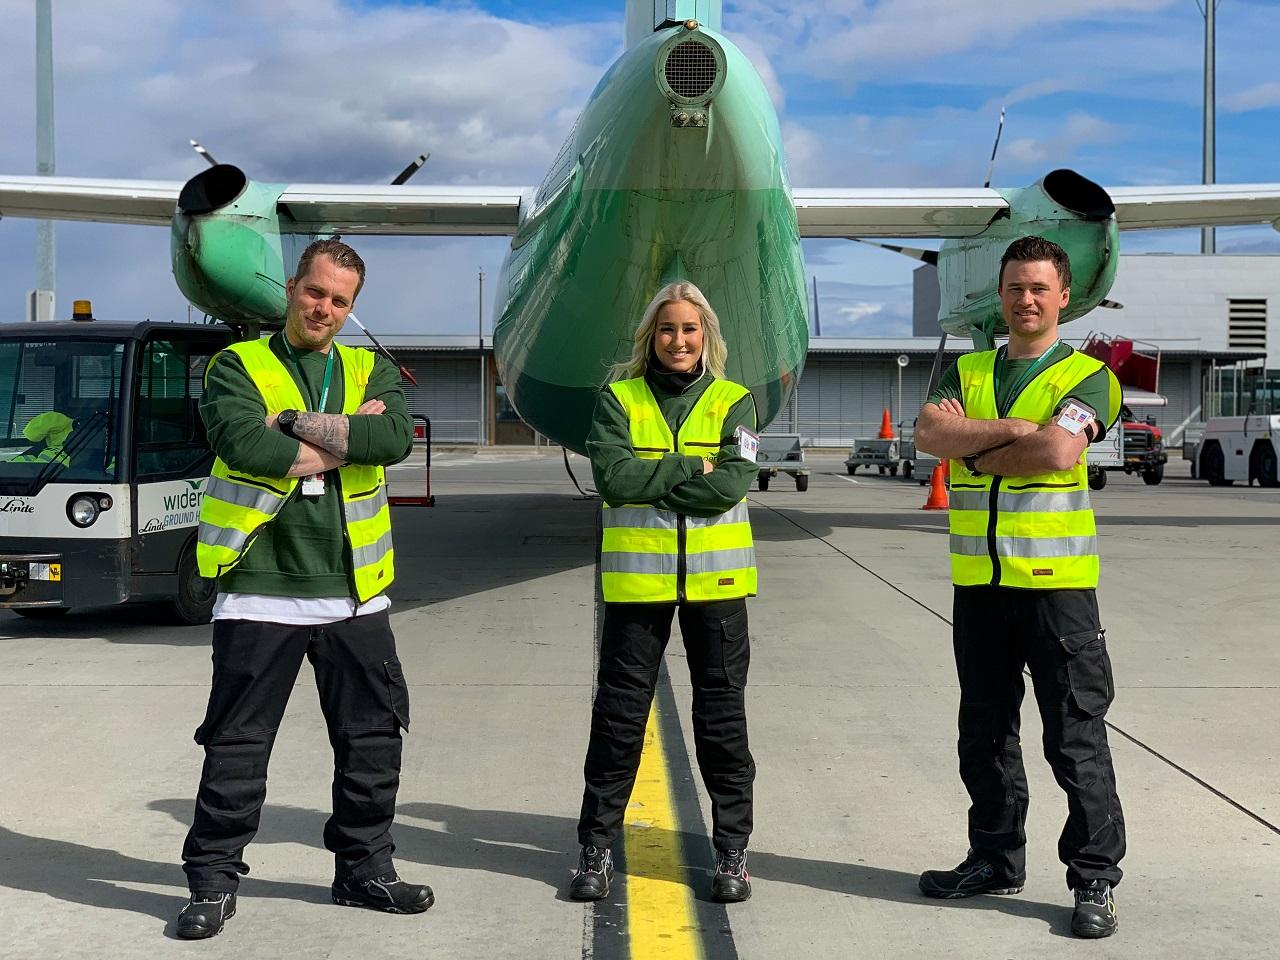 Medarbeidere - Widerøe Ground Handling - WGH - Oslo lufthavn